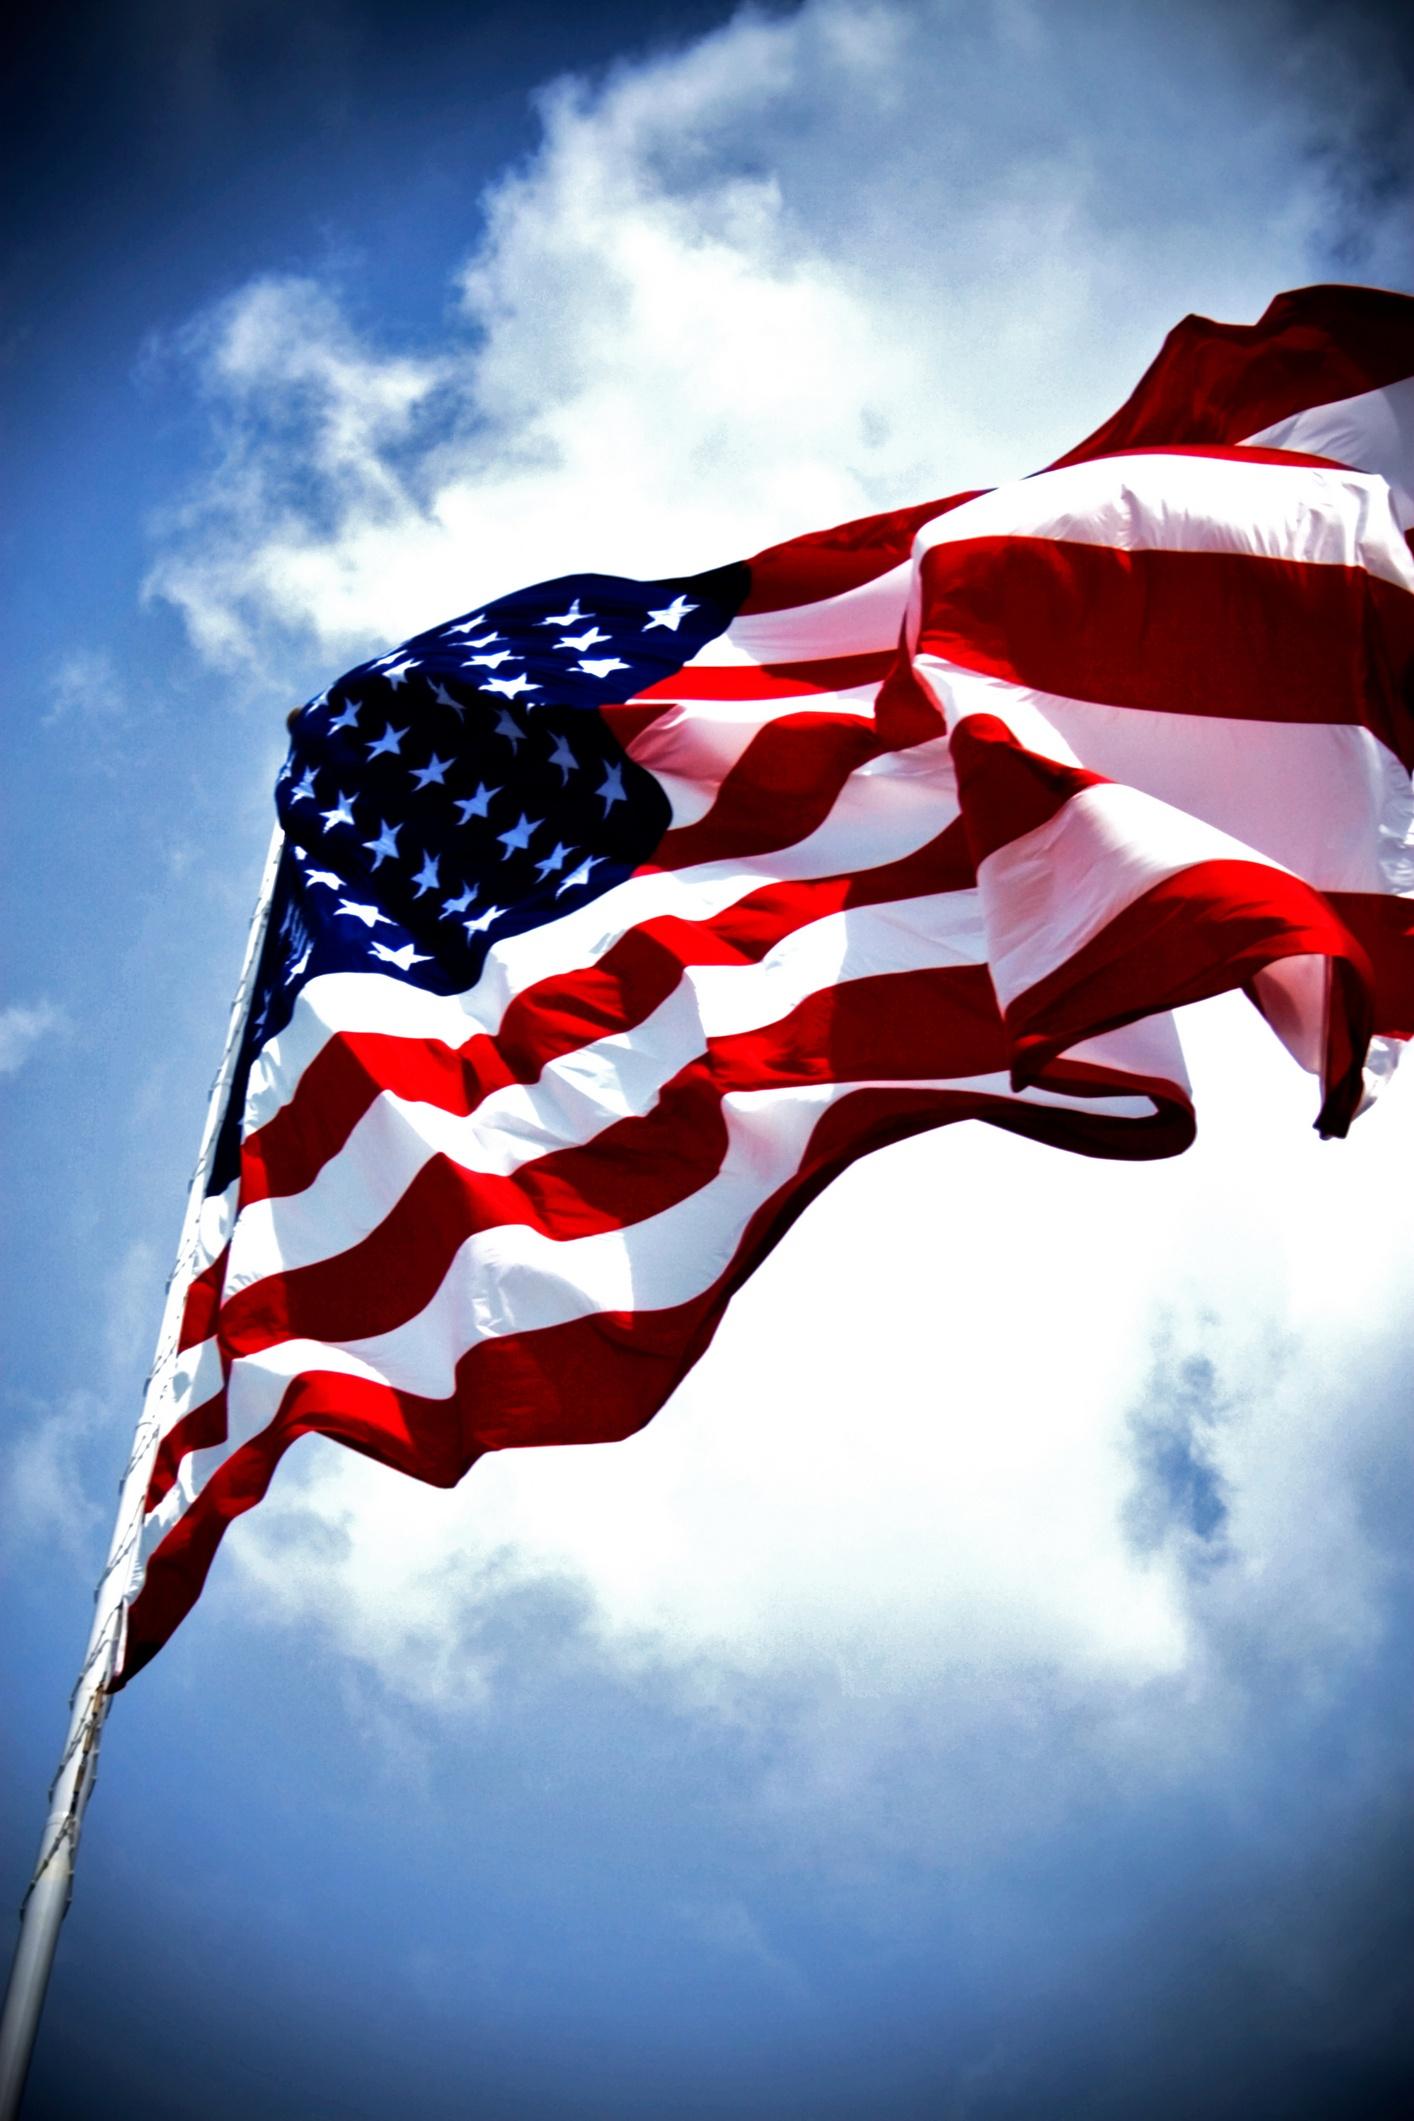 بالصور صور علم امريكا , اجمل صور لعلم امريكا 980 11